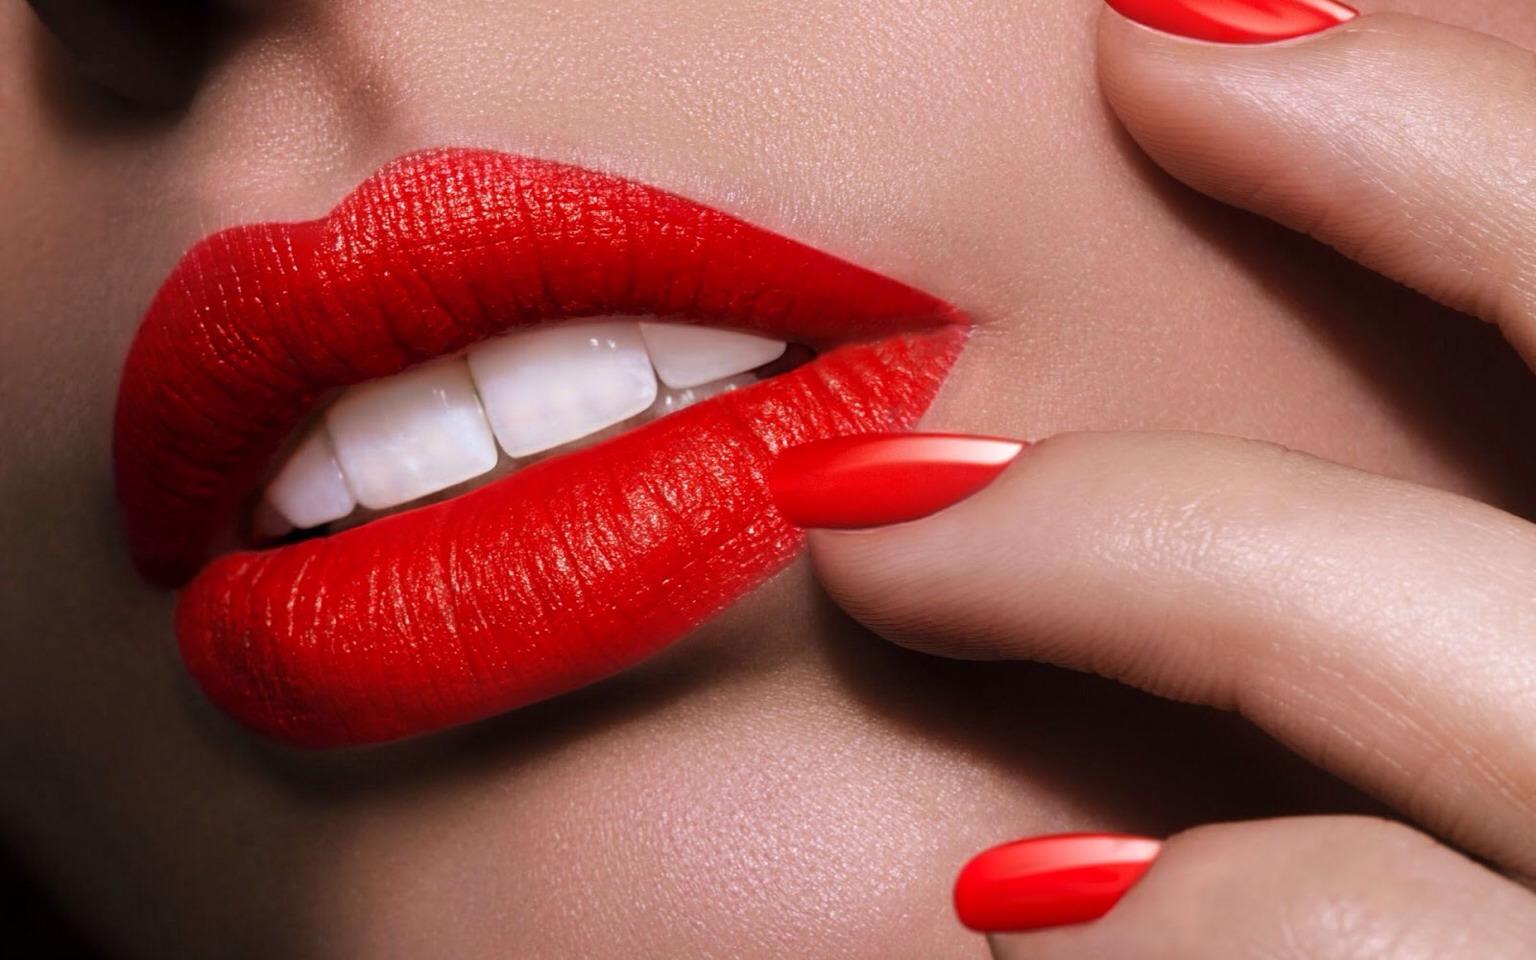 Apply red lipstick